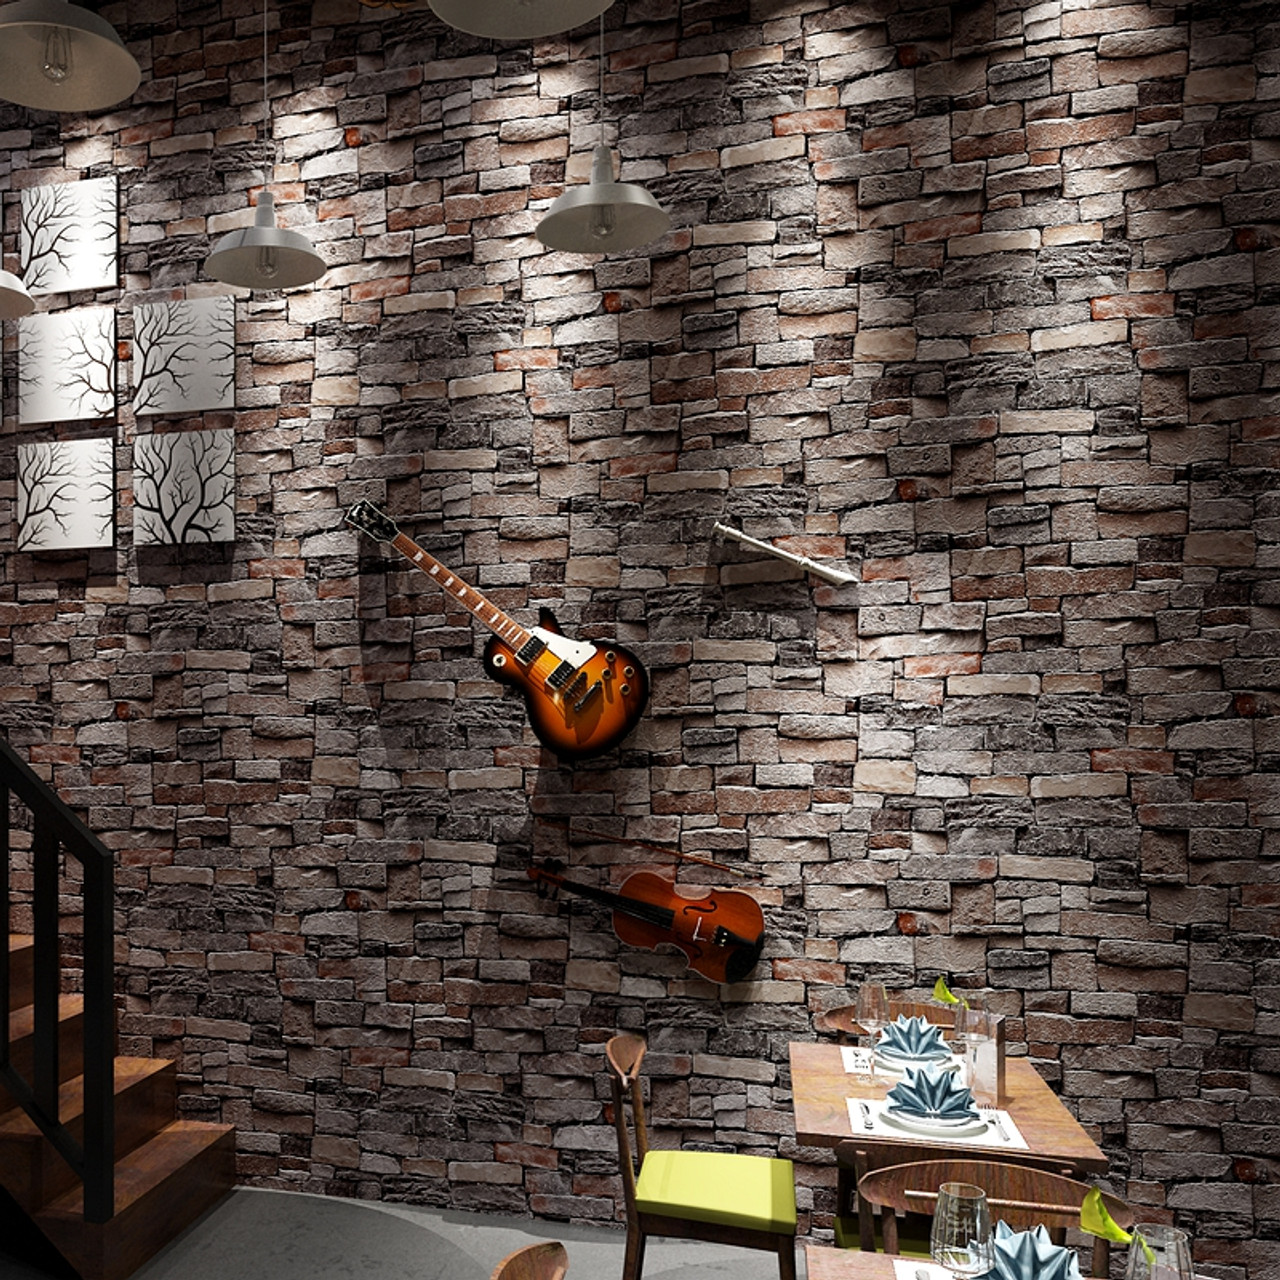 Vintage Stone Brick Wallpaper For Walls Roll 3D PVC Waterproof Wallpapers Living Room Restaurant Desktop